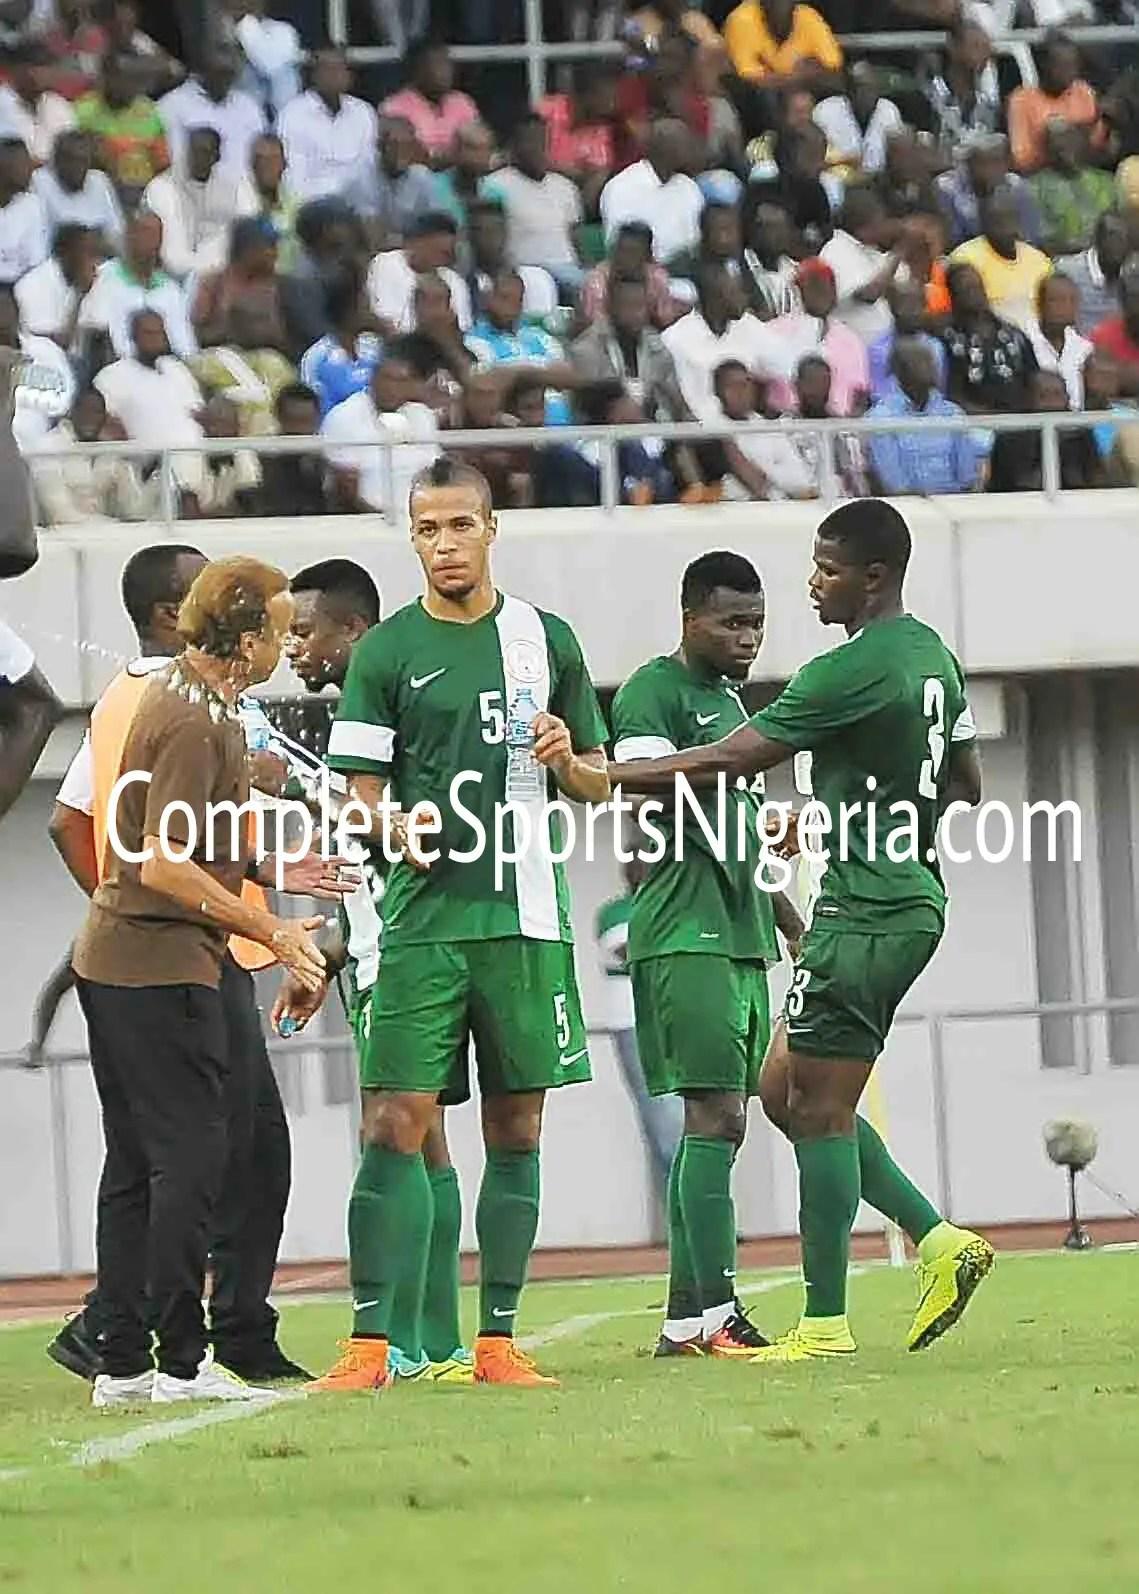 Ikhana Backs Rorh To Lead Super Eagles To World Cup